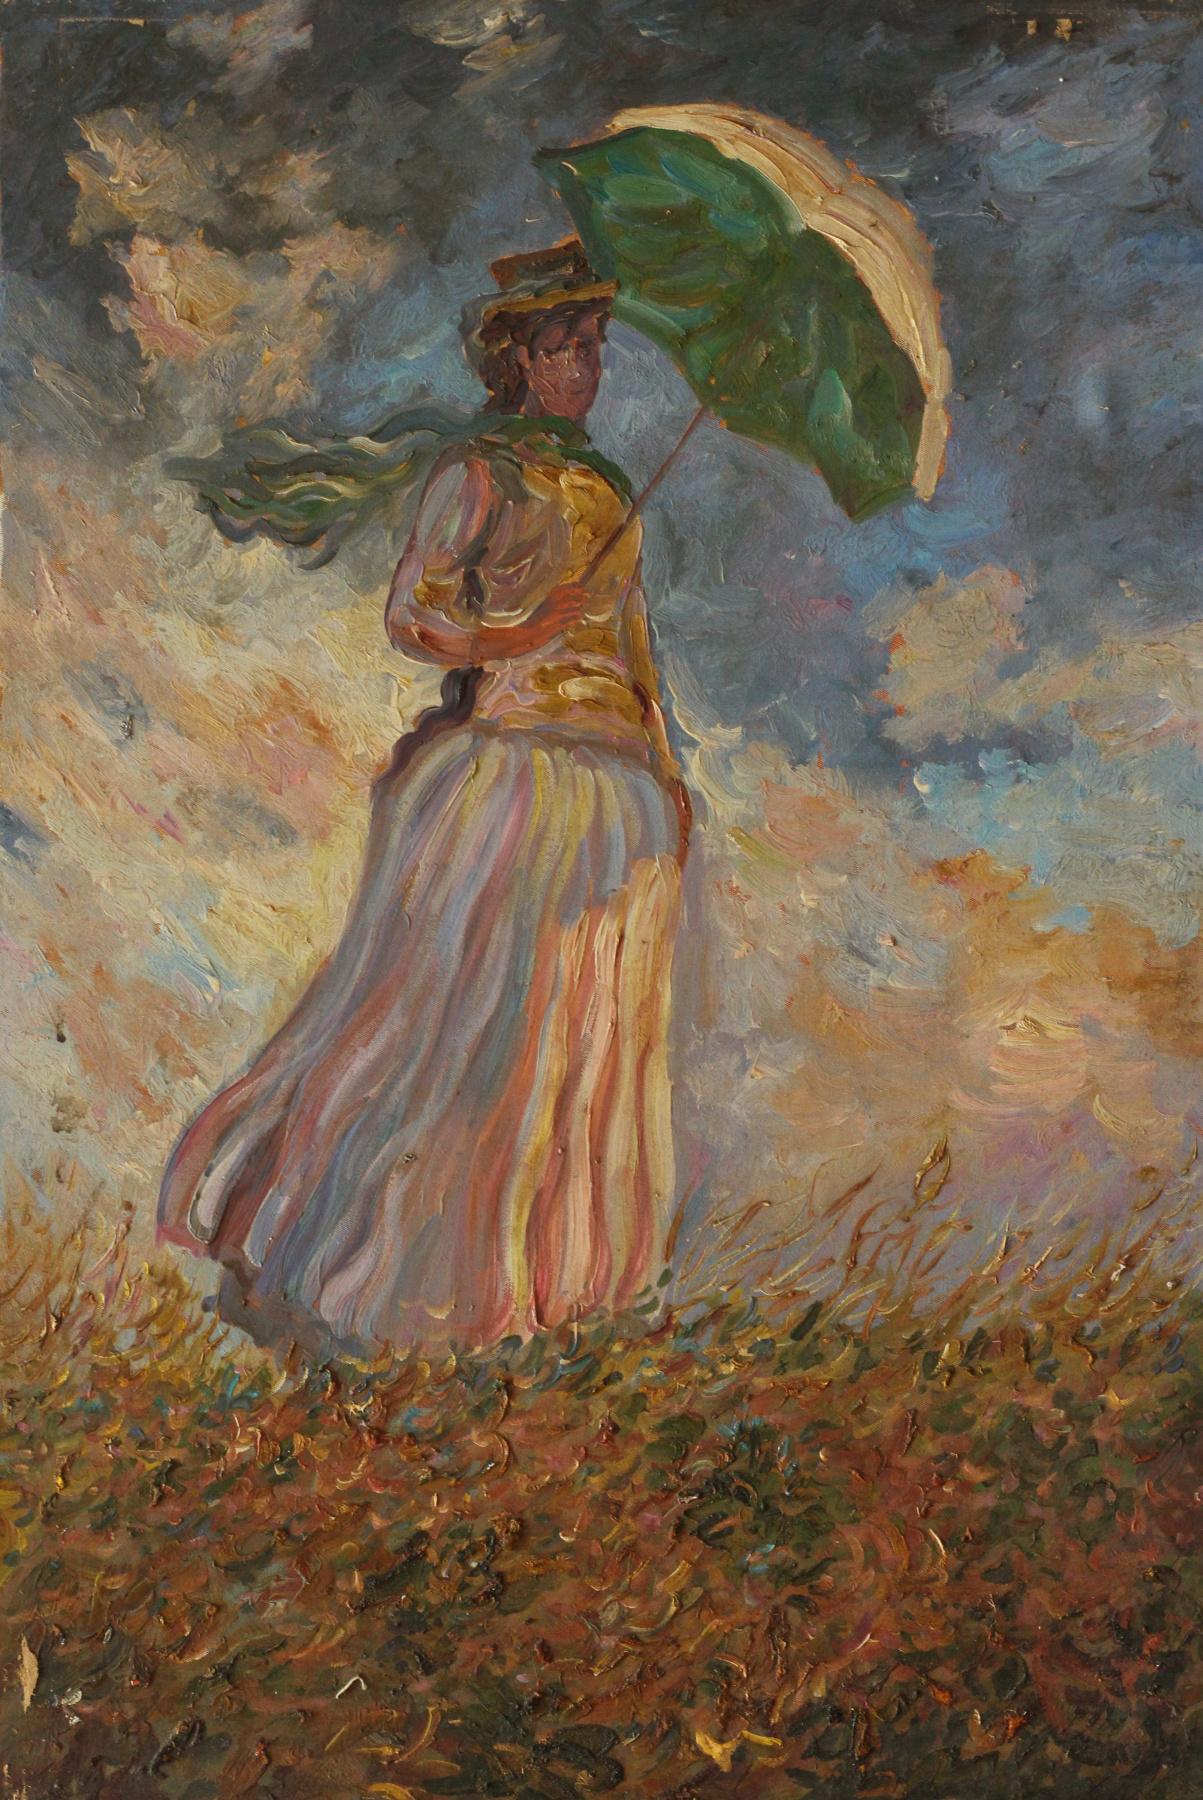 Unknown artist. Girl with an umbrella (Monet)